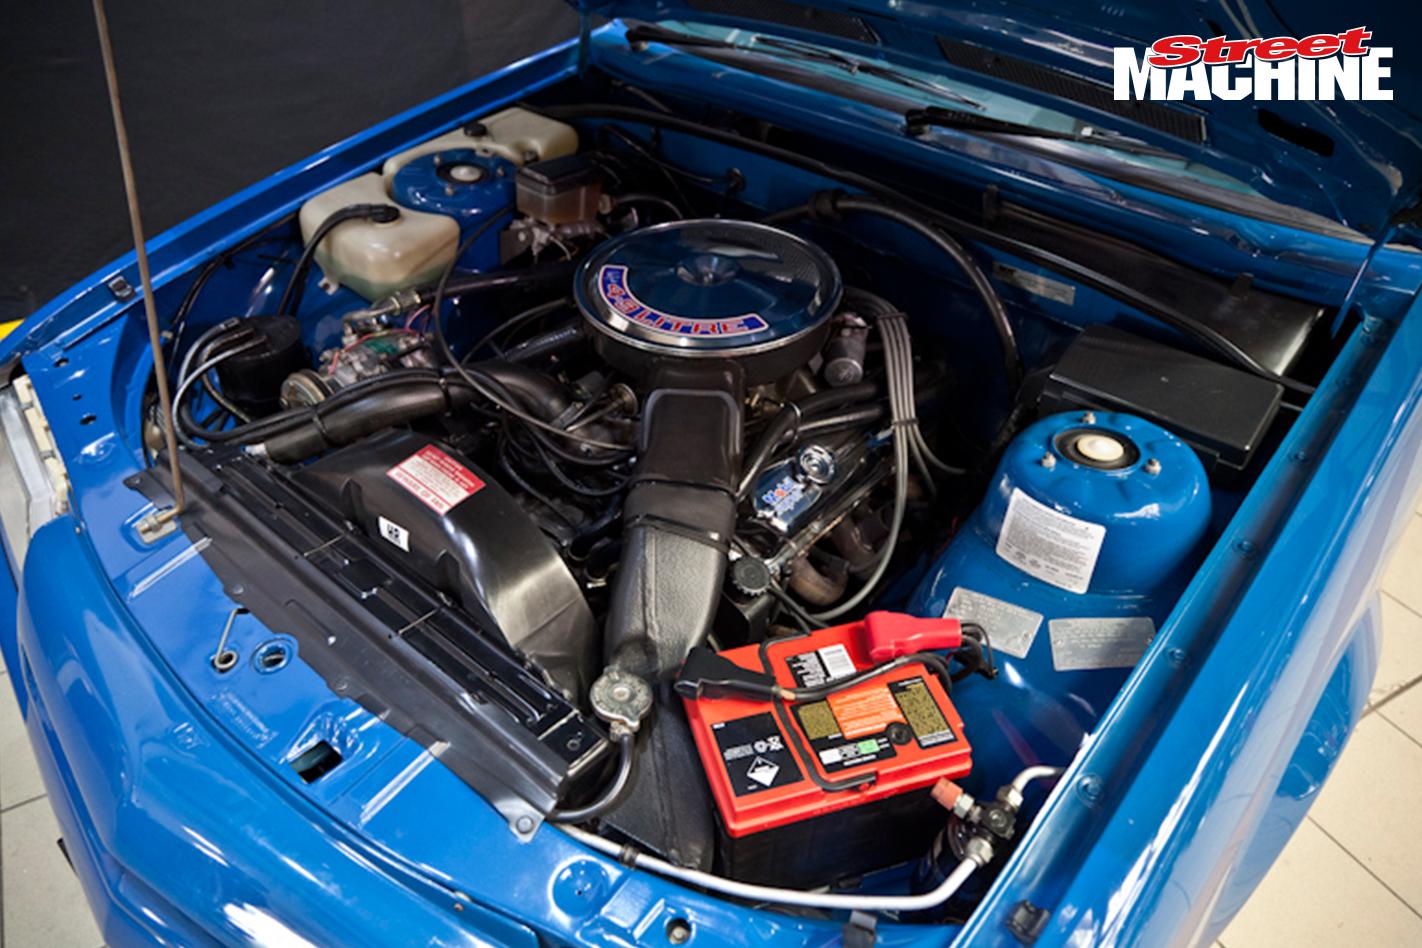 VK Commodore SS Brock Engine